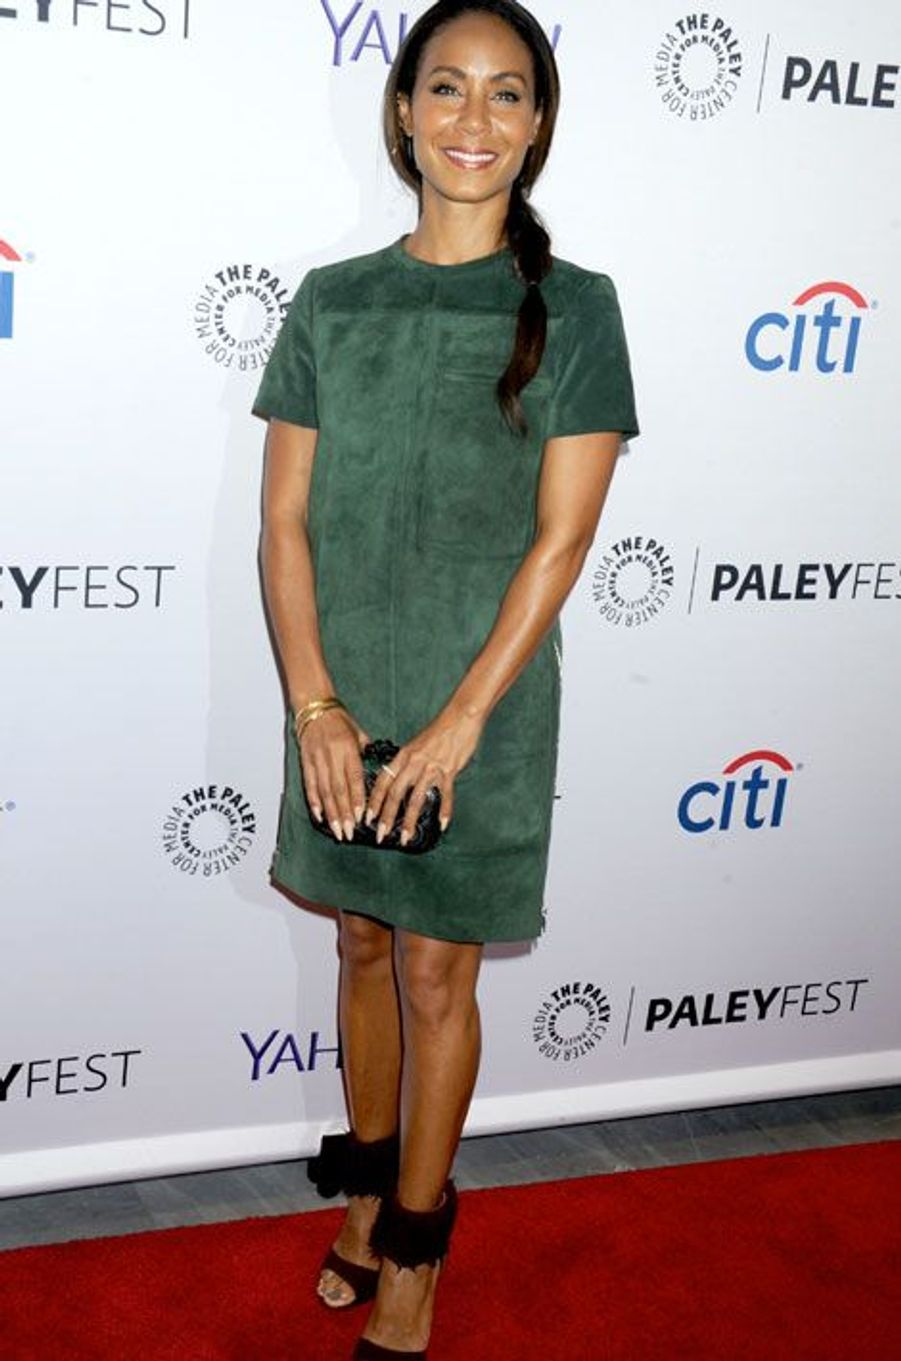 La femme de Will Smith, Jada Pinkett Smith, lors d'une soirée à New York, le 18 octobre 2014